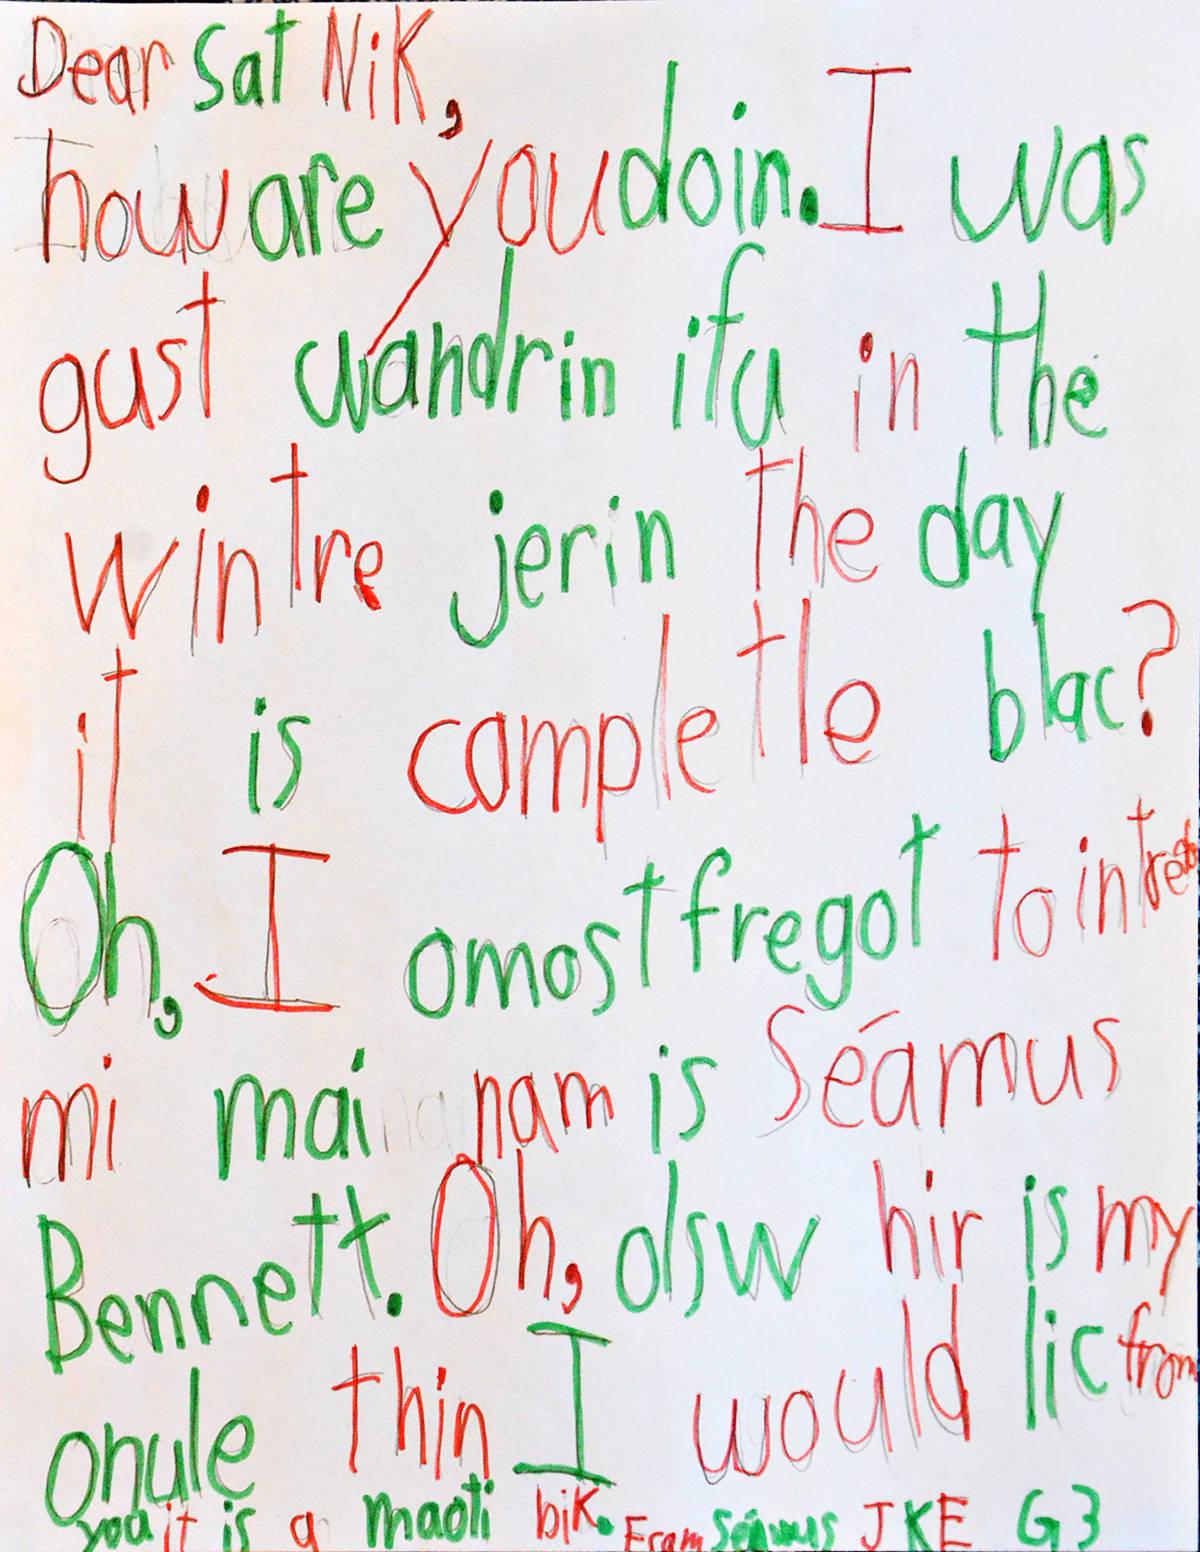 Seamus, Grade 3, James Kennedy Elementary